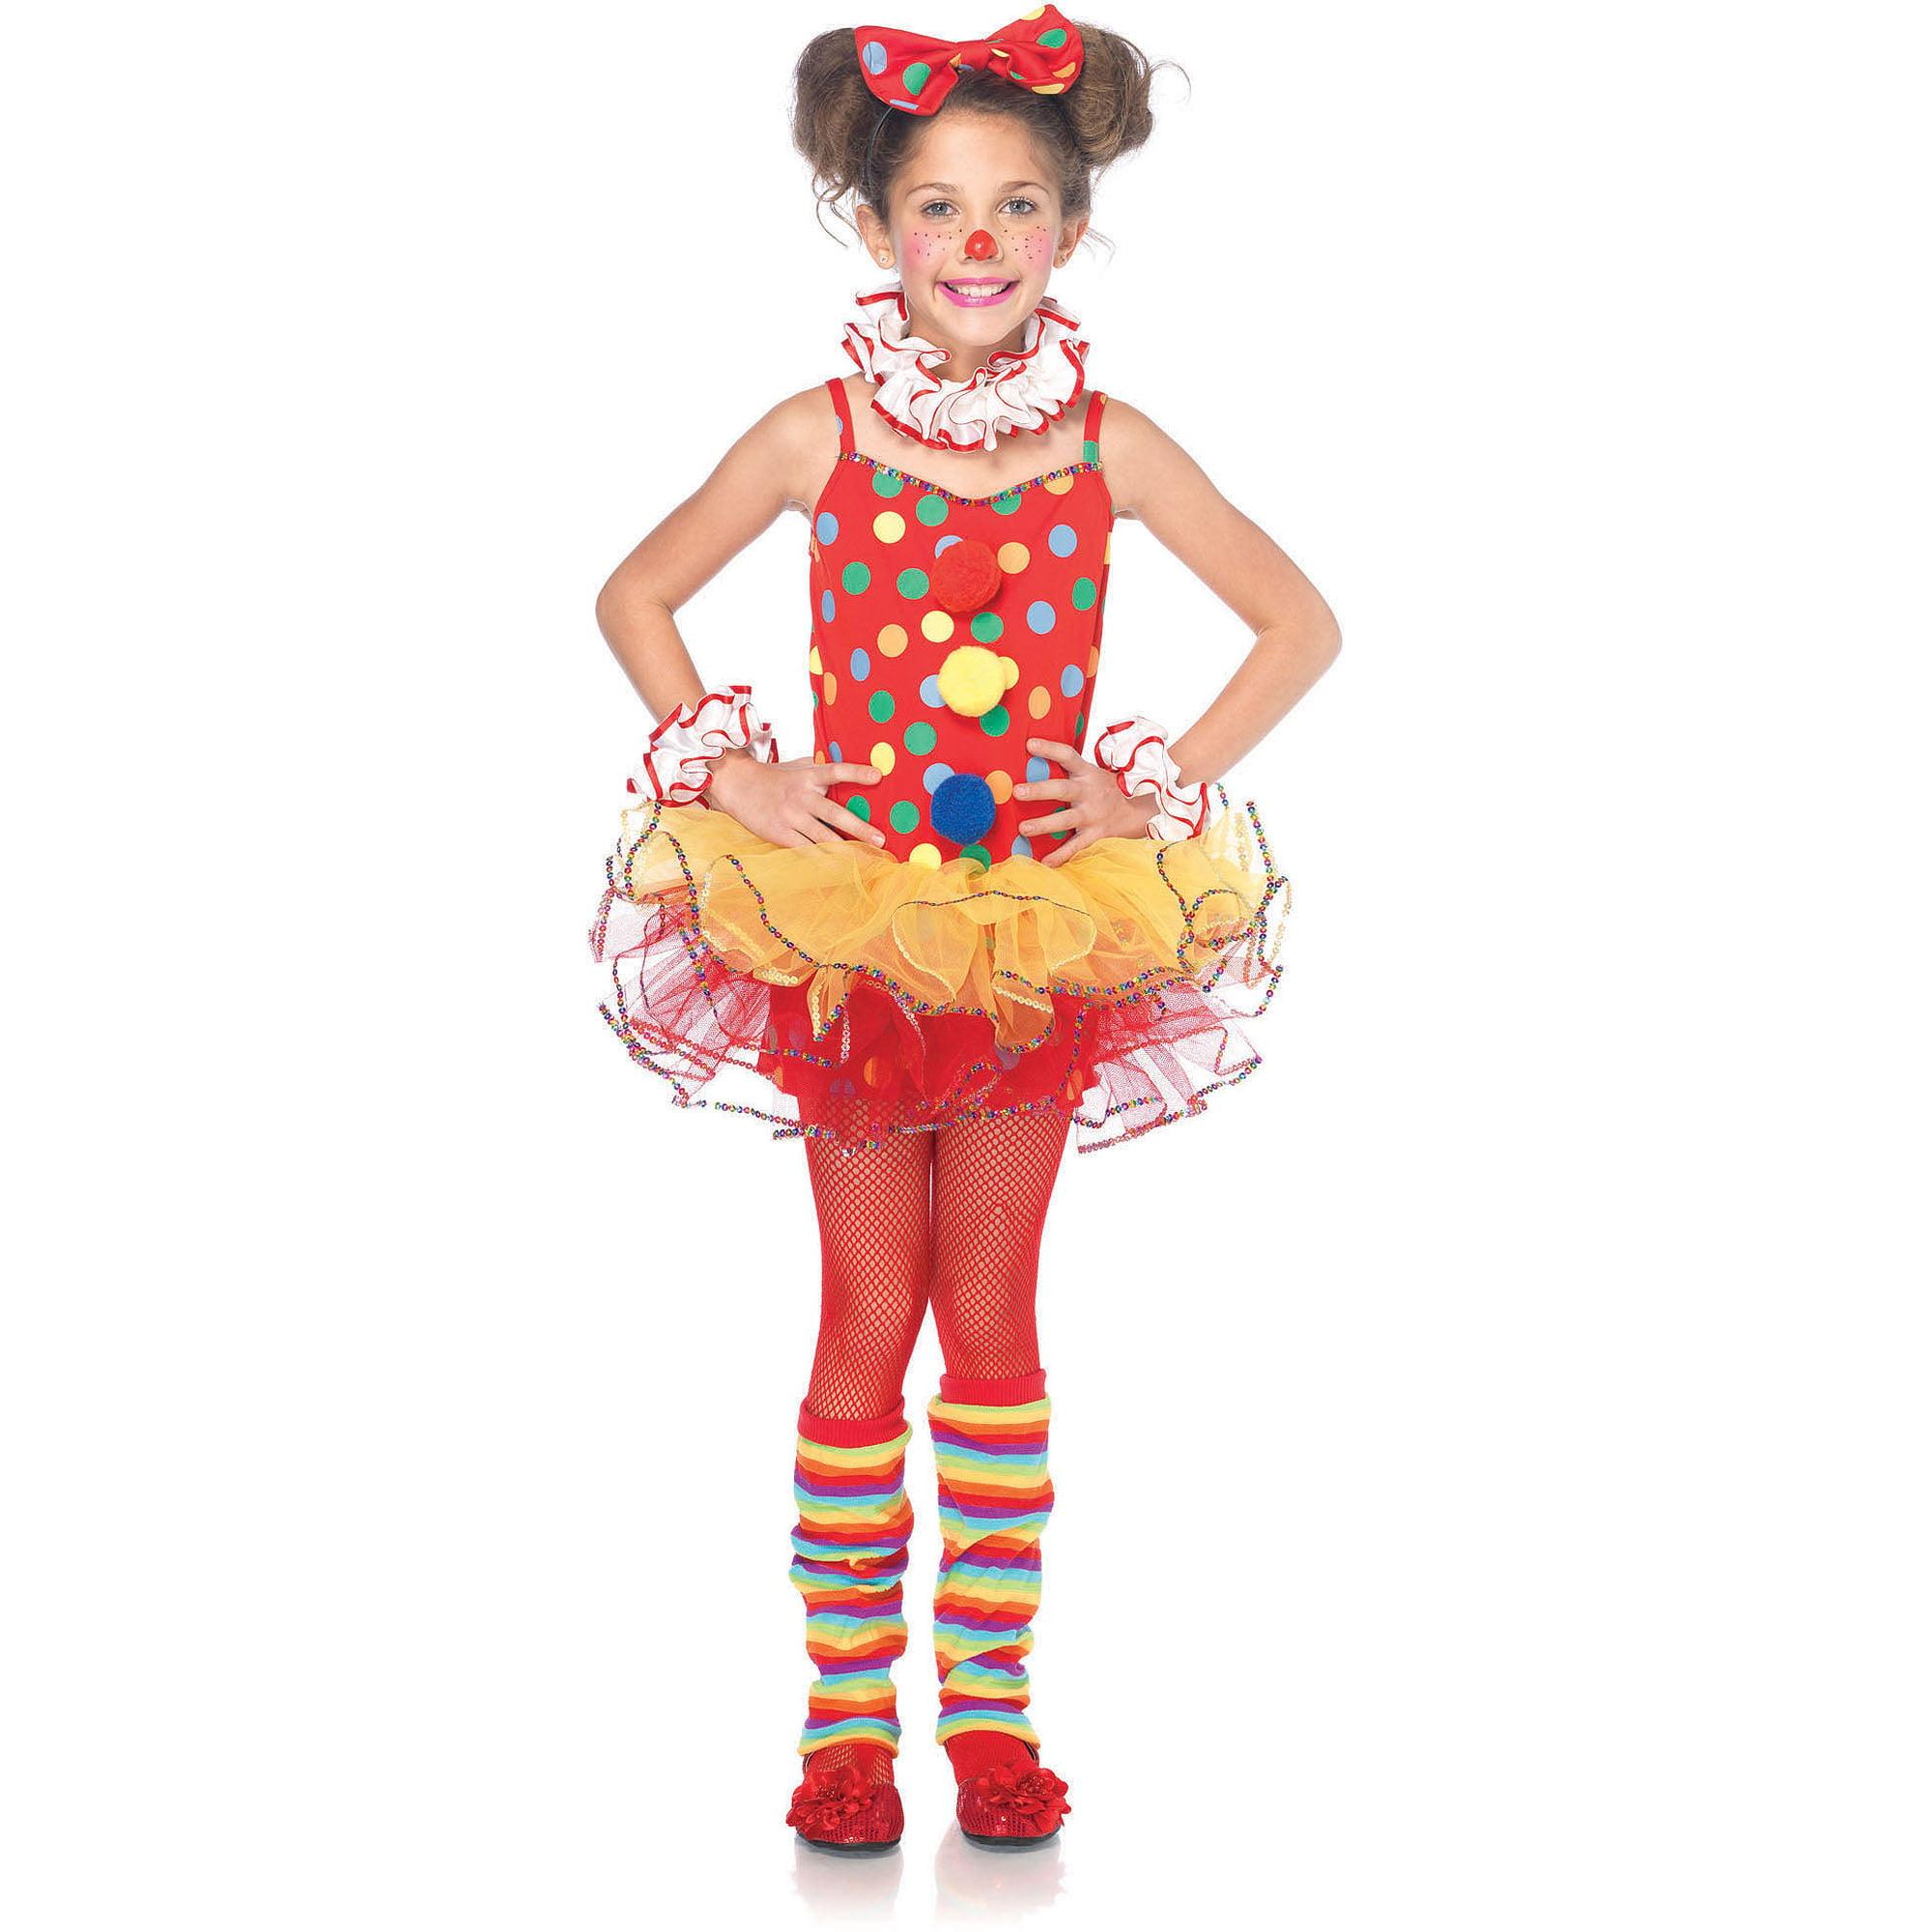 Circus Clown Child Halloween Costume